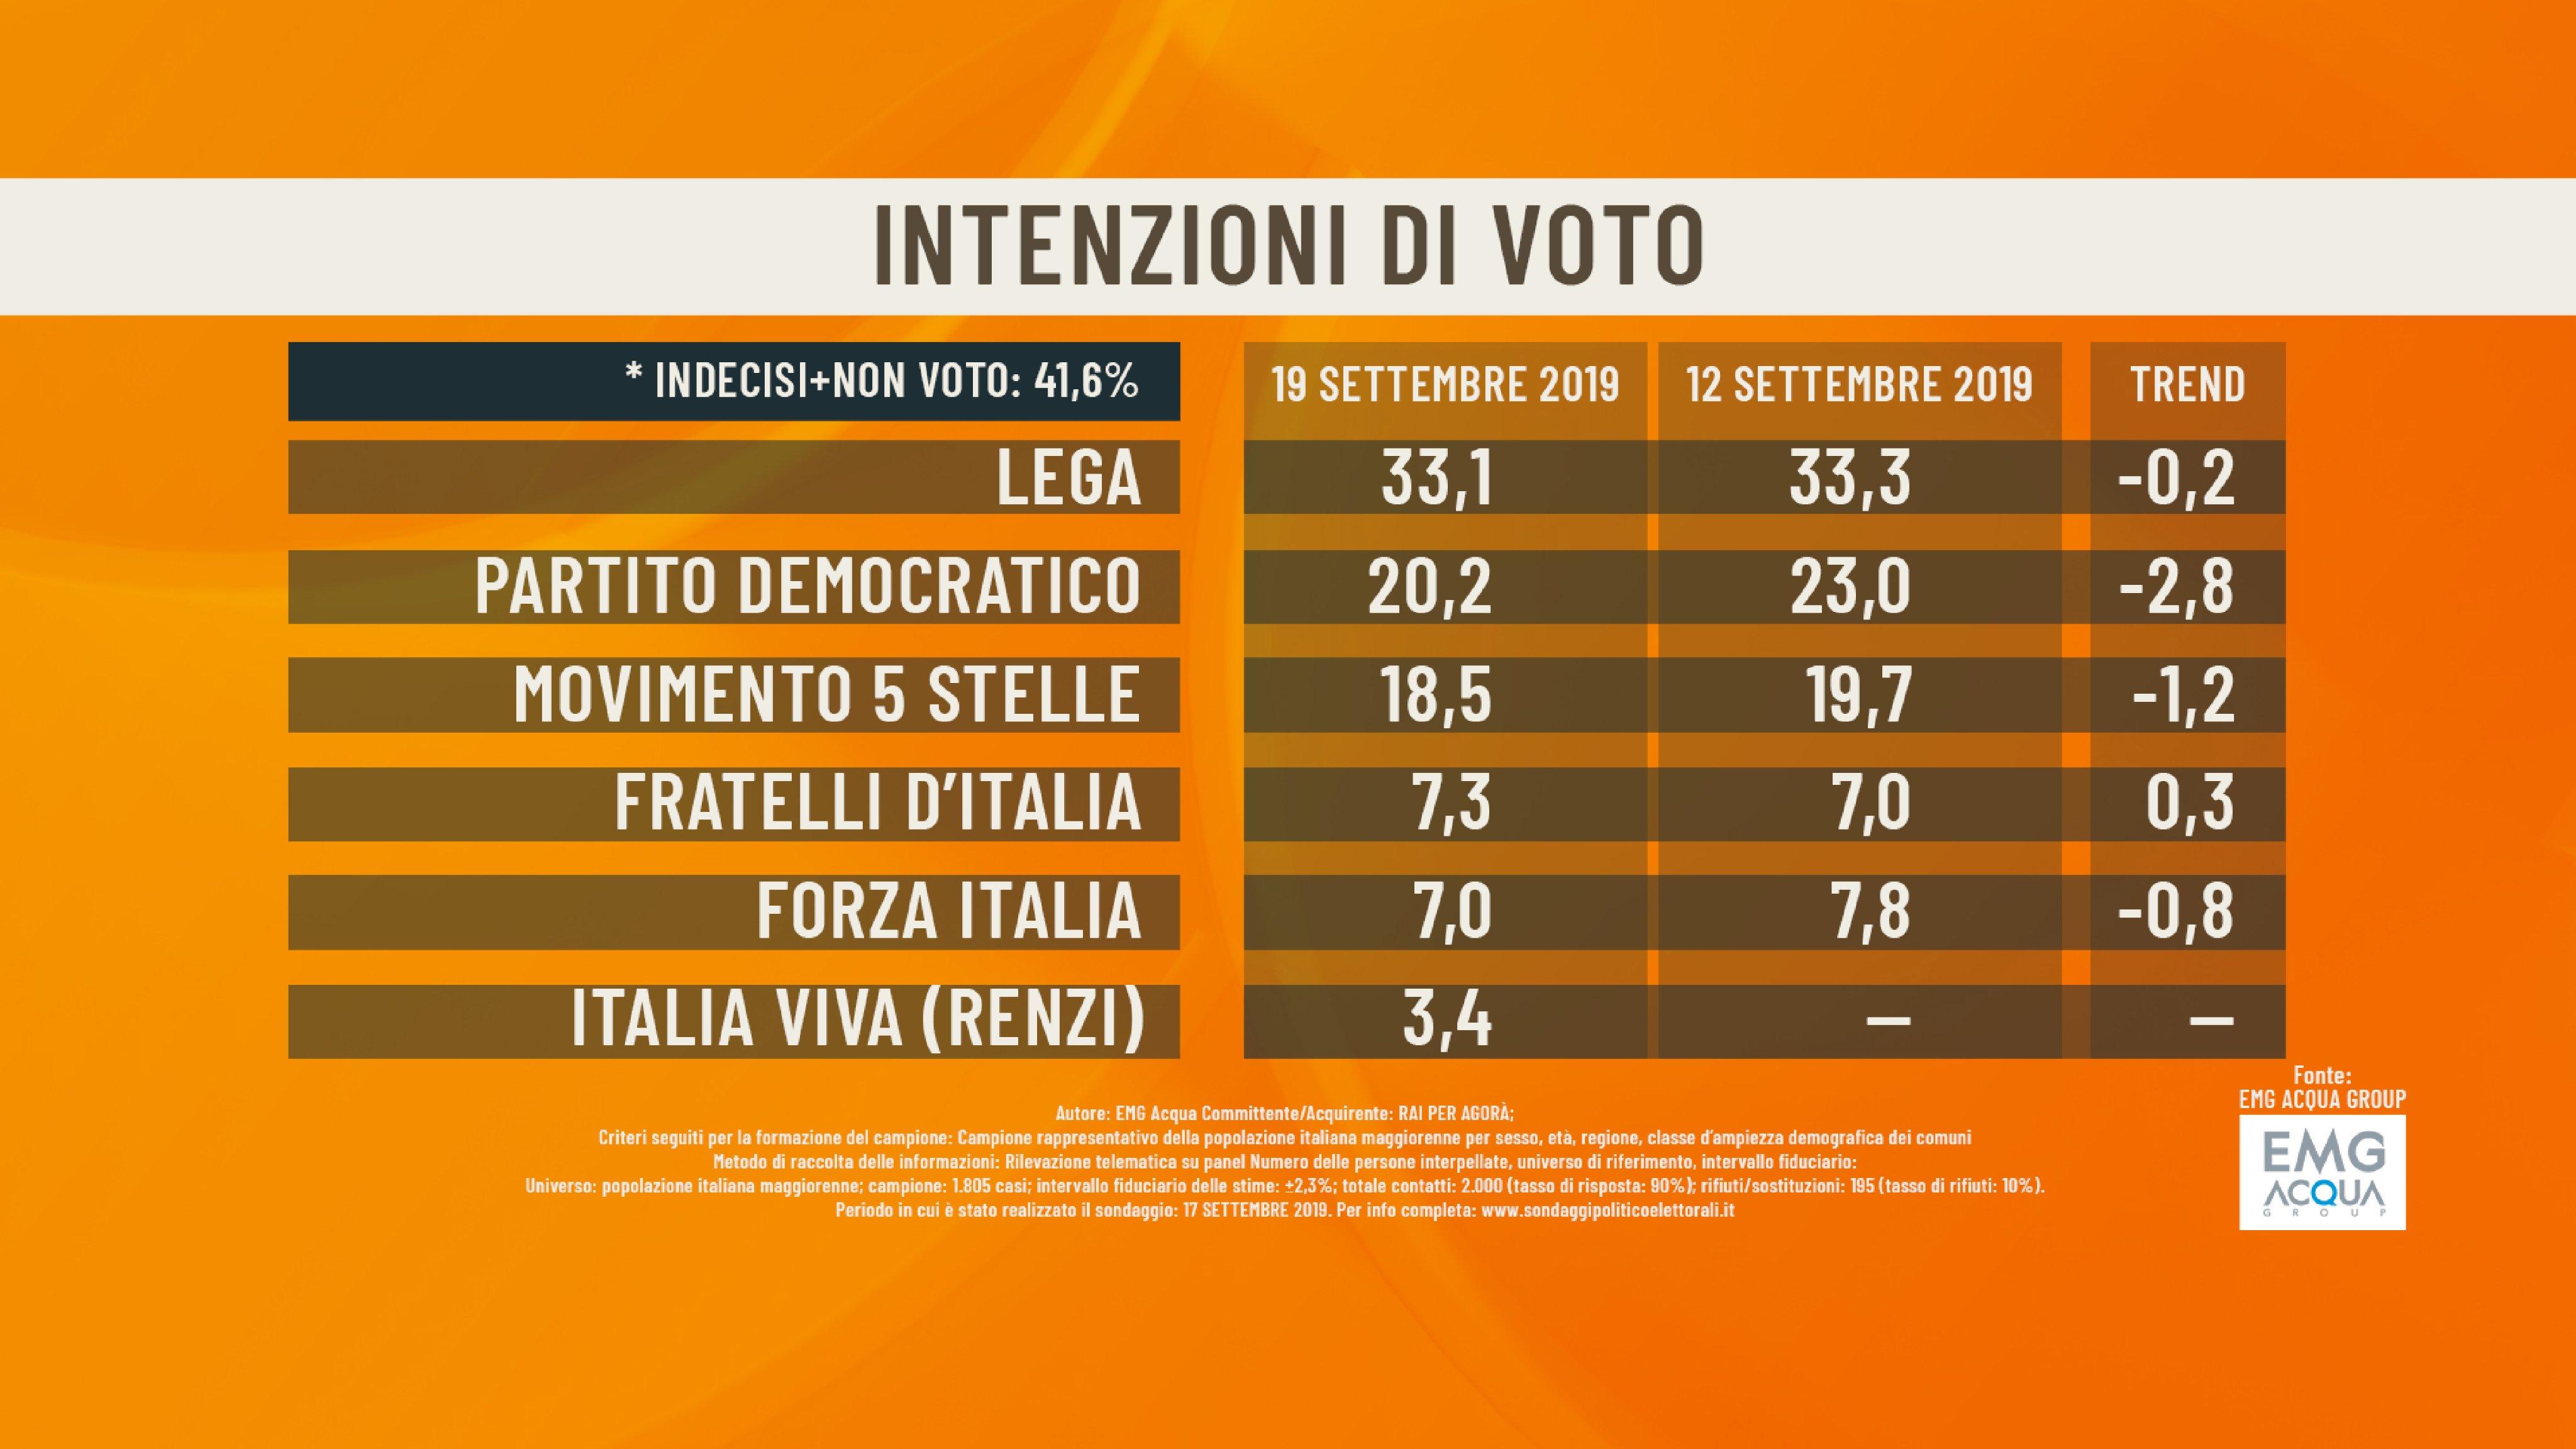 sondaggi partito di renzi italia viva